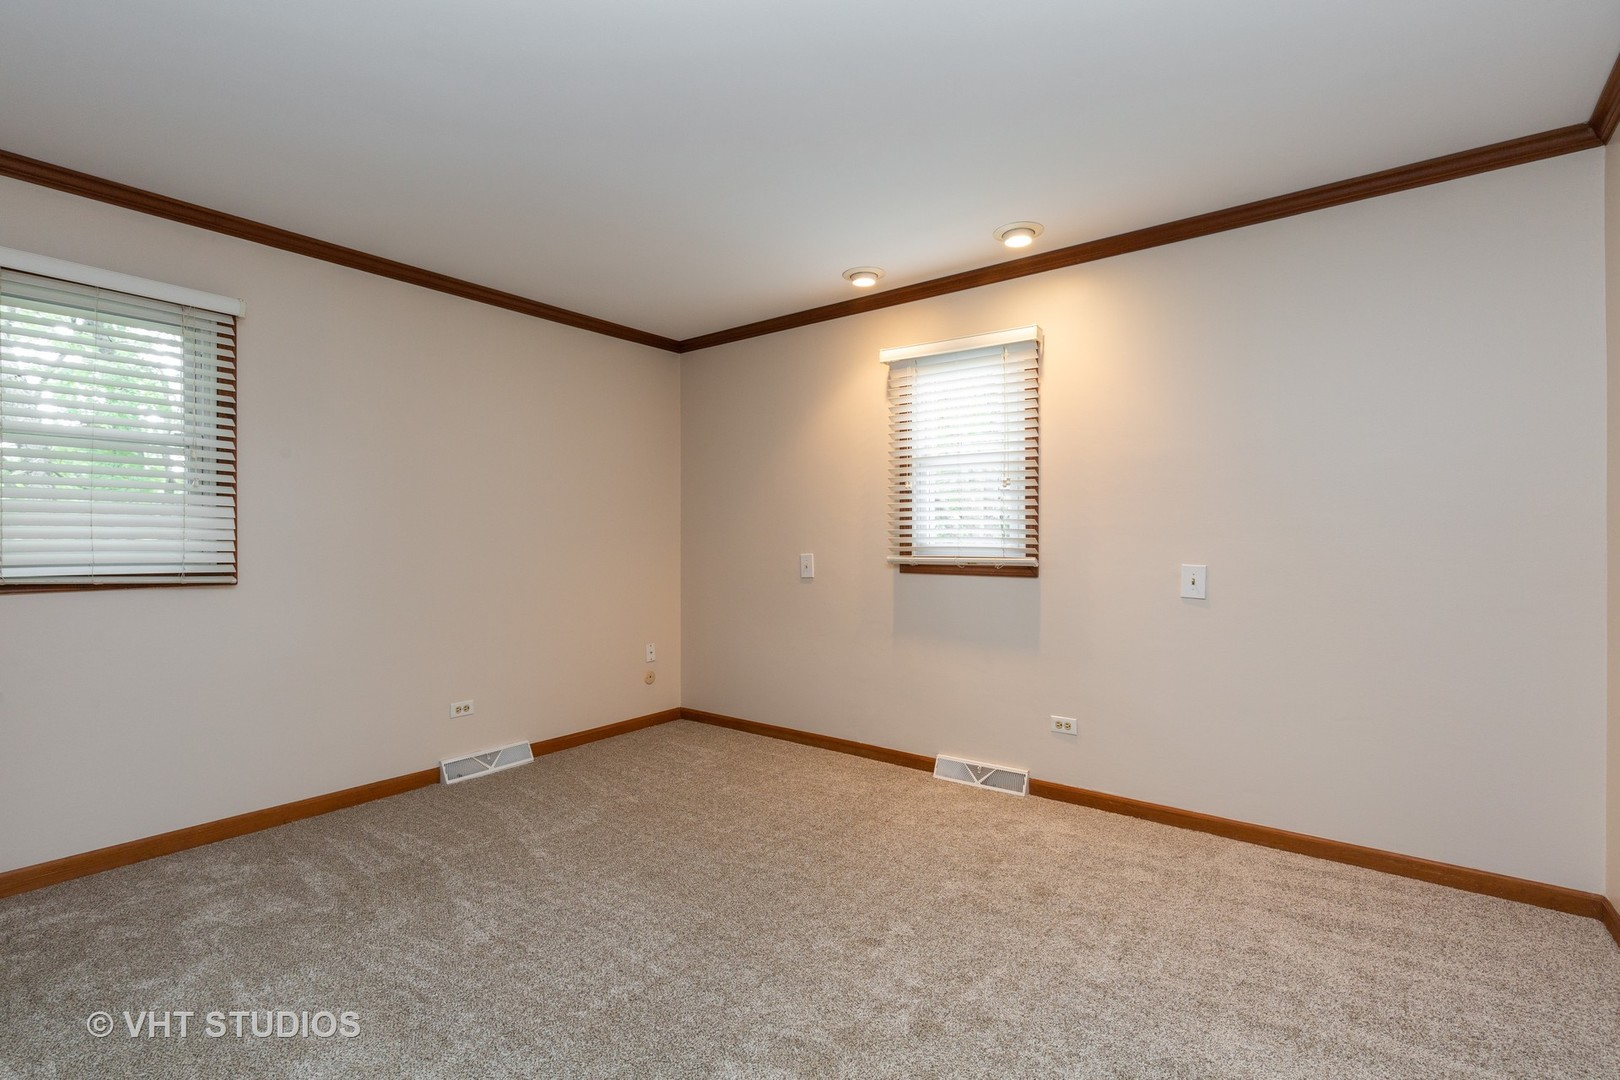 19 Walnut, Algonquin, Illinois, 60102